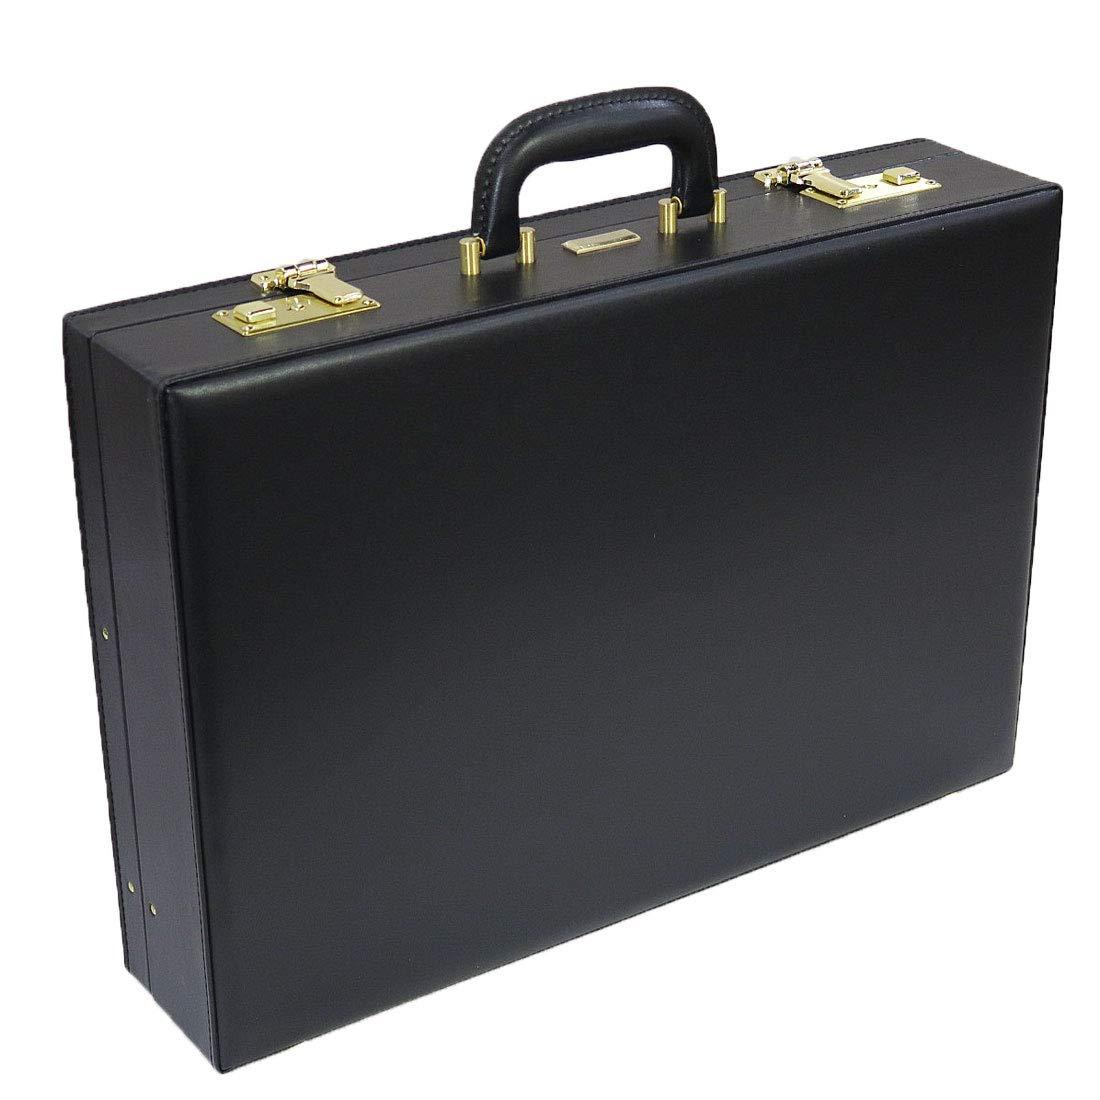 J.C HAMILTON 合成皮革製アタッシュケース 48cm[A3対応]21225 (ブラック) B07HD571WB